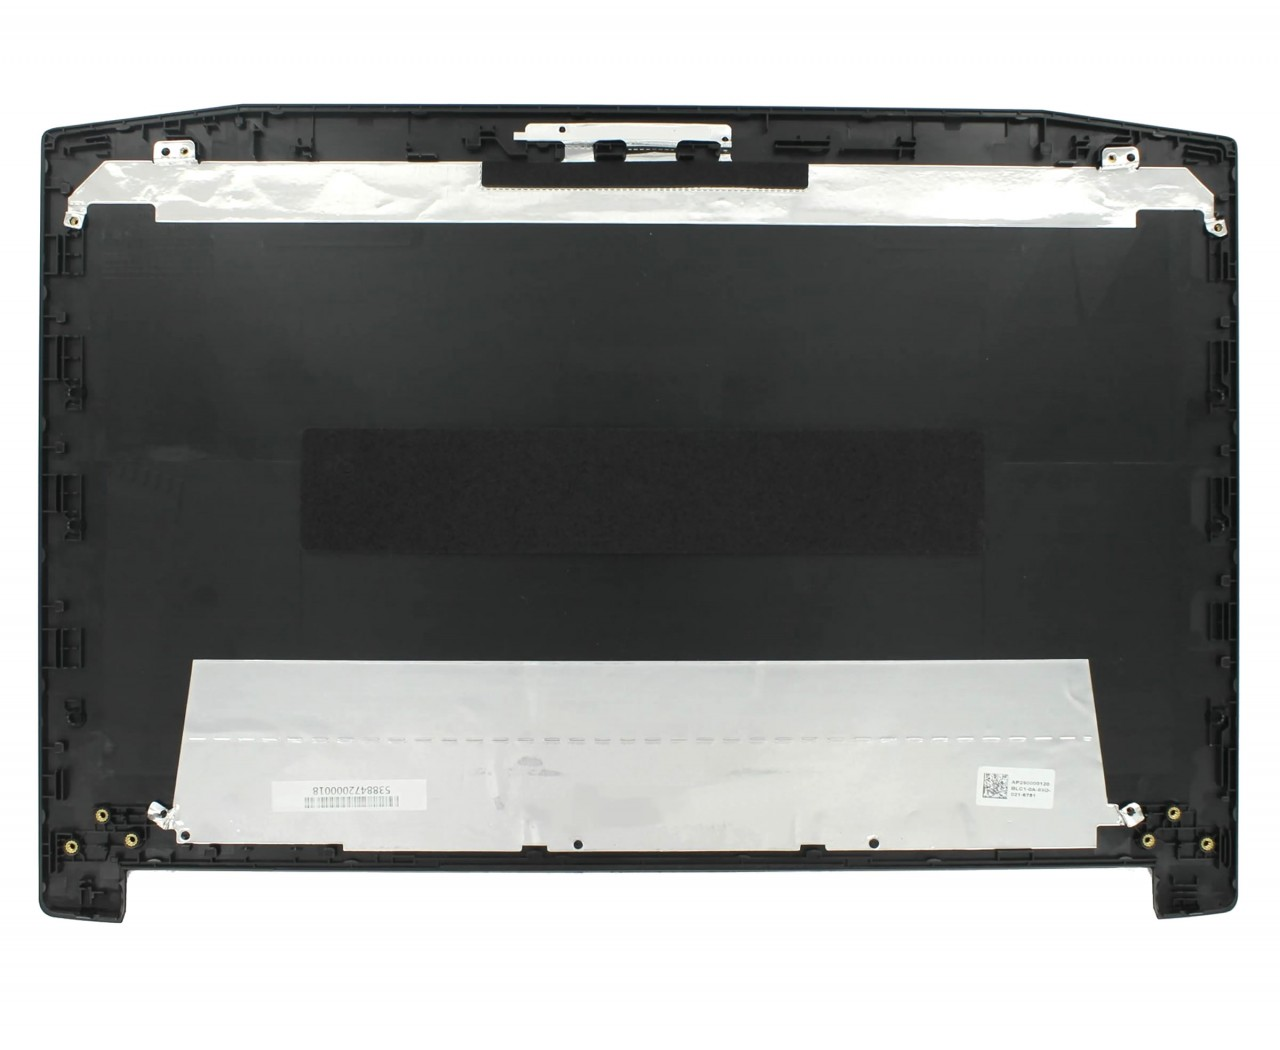 Capac Display BackCover Acer Nitro 5 AN515-42 Carcasa Display imagine powerlaptop.ro 2021